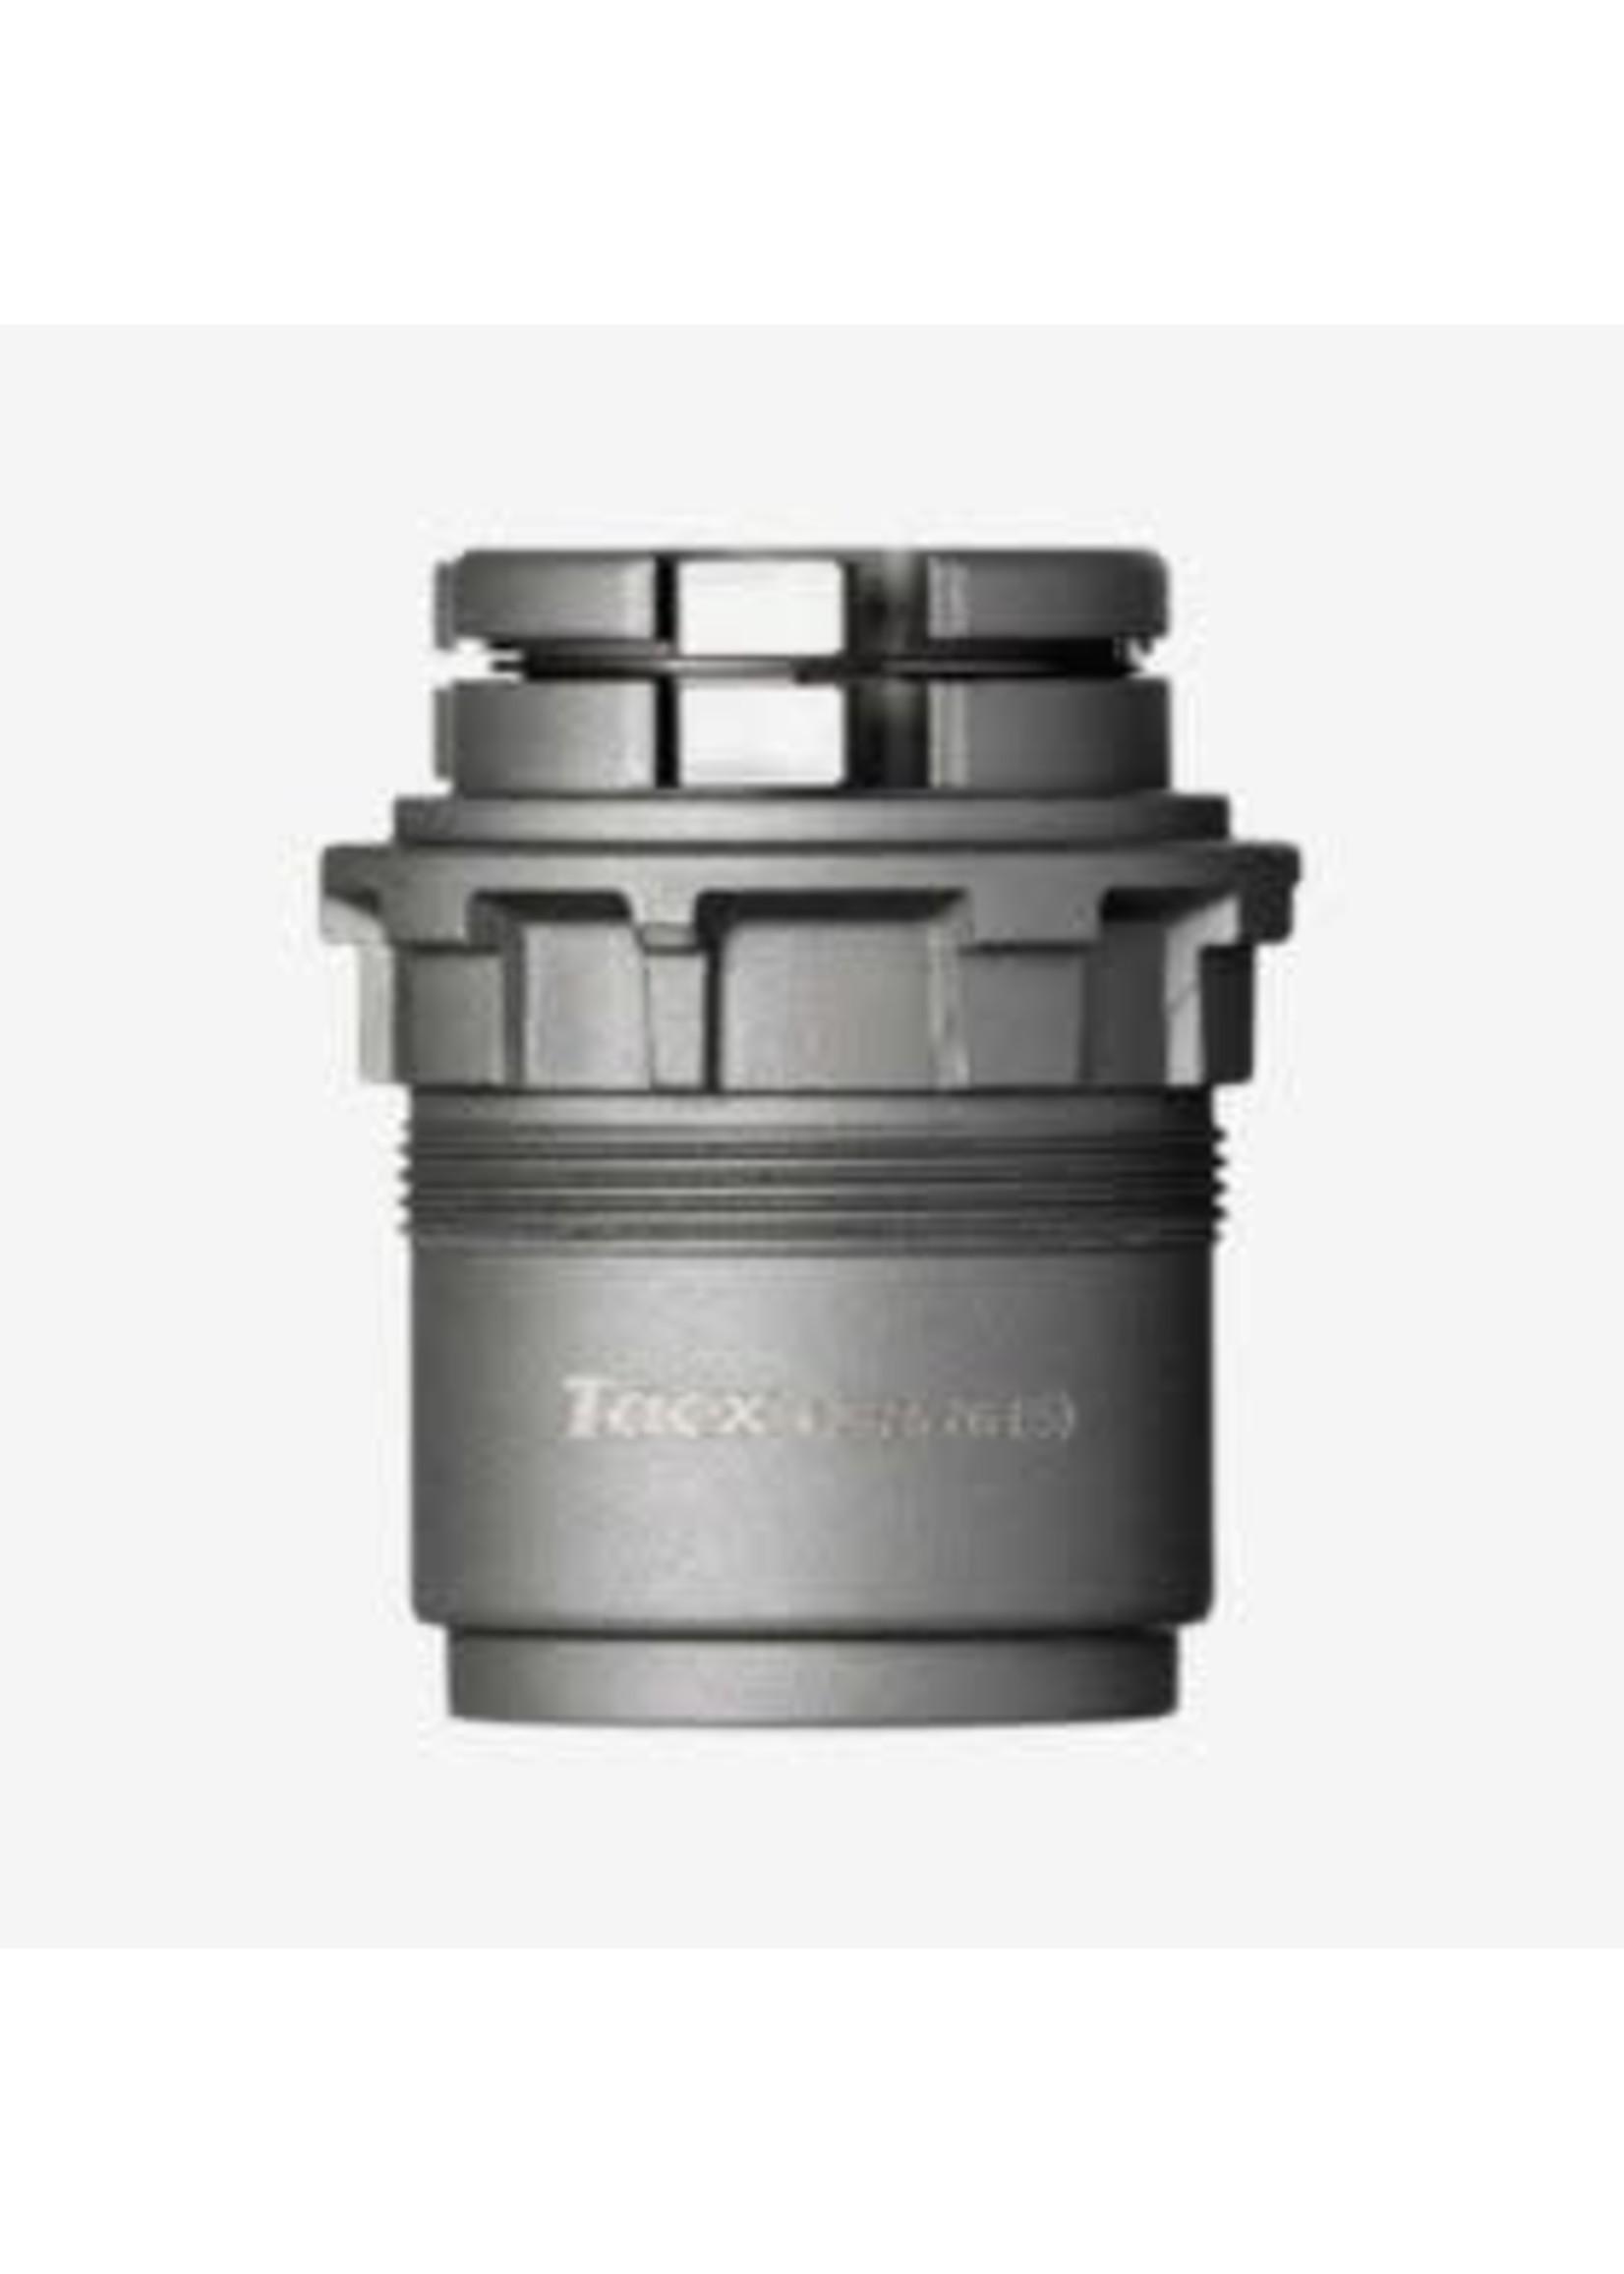 Tacx Tacx, Direct Drive Freehub Body, SRAM XD-R